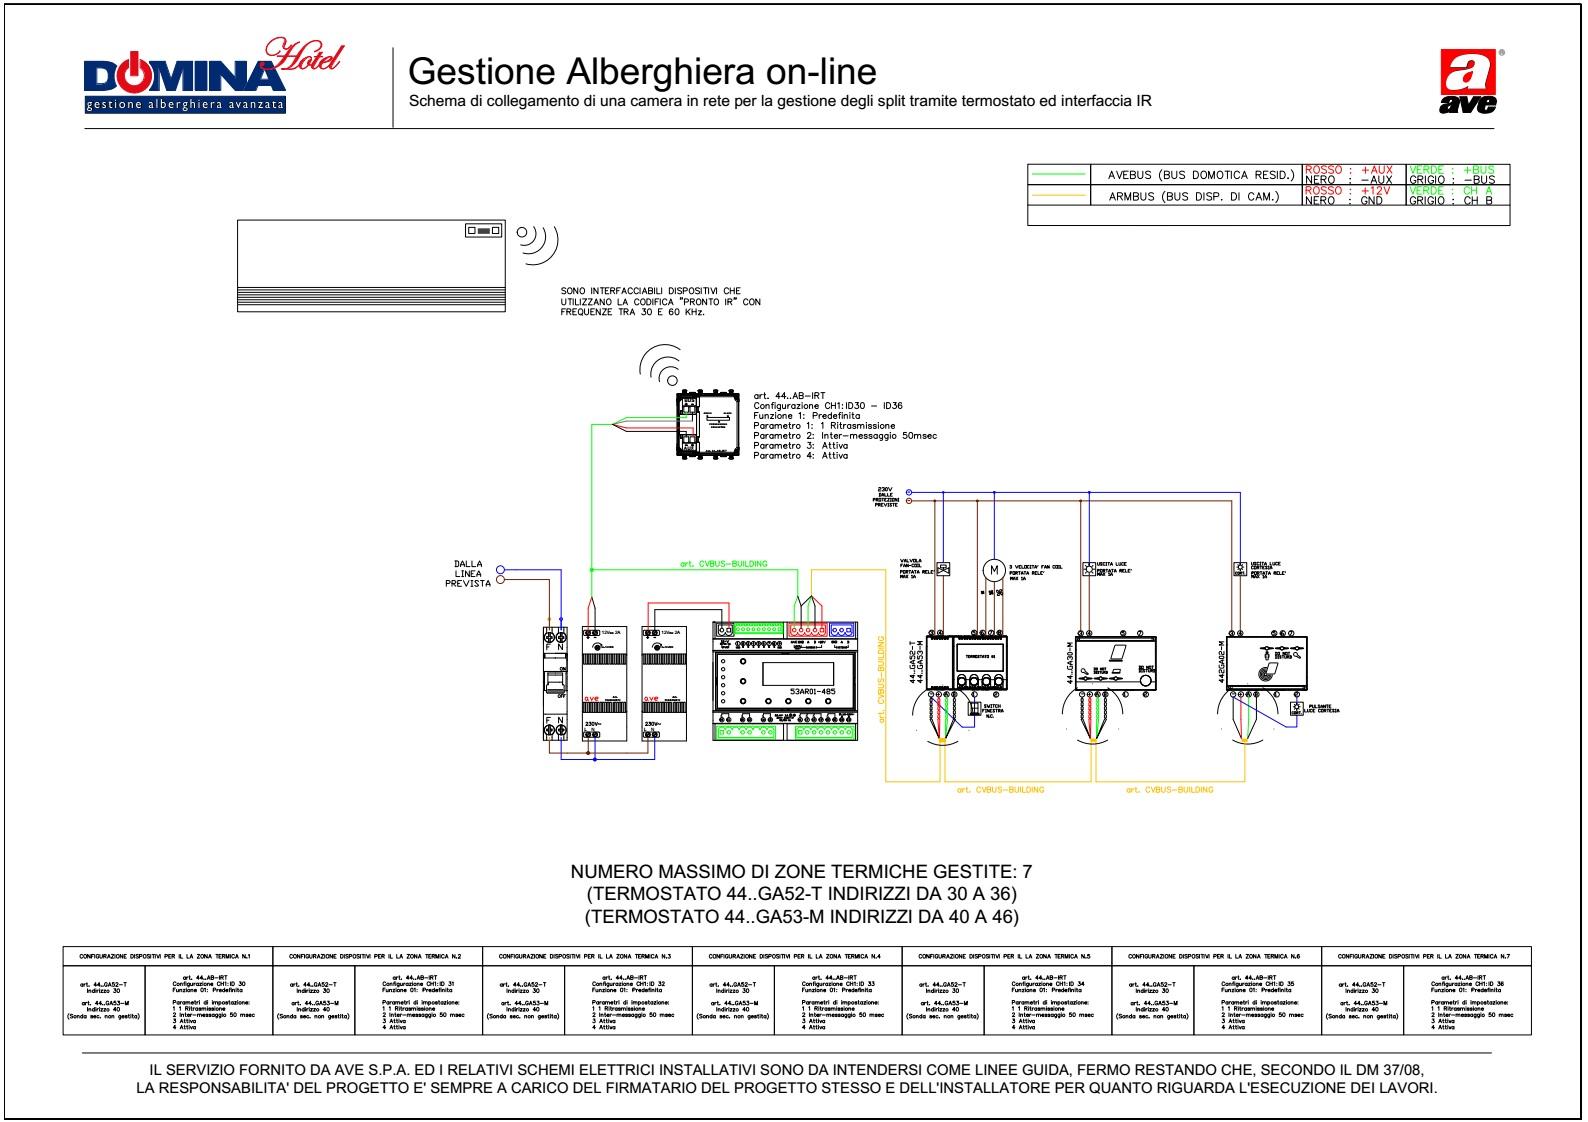 Gestione Alberghiera on-line - gestione split tramite 44..AB-IRT